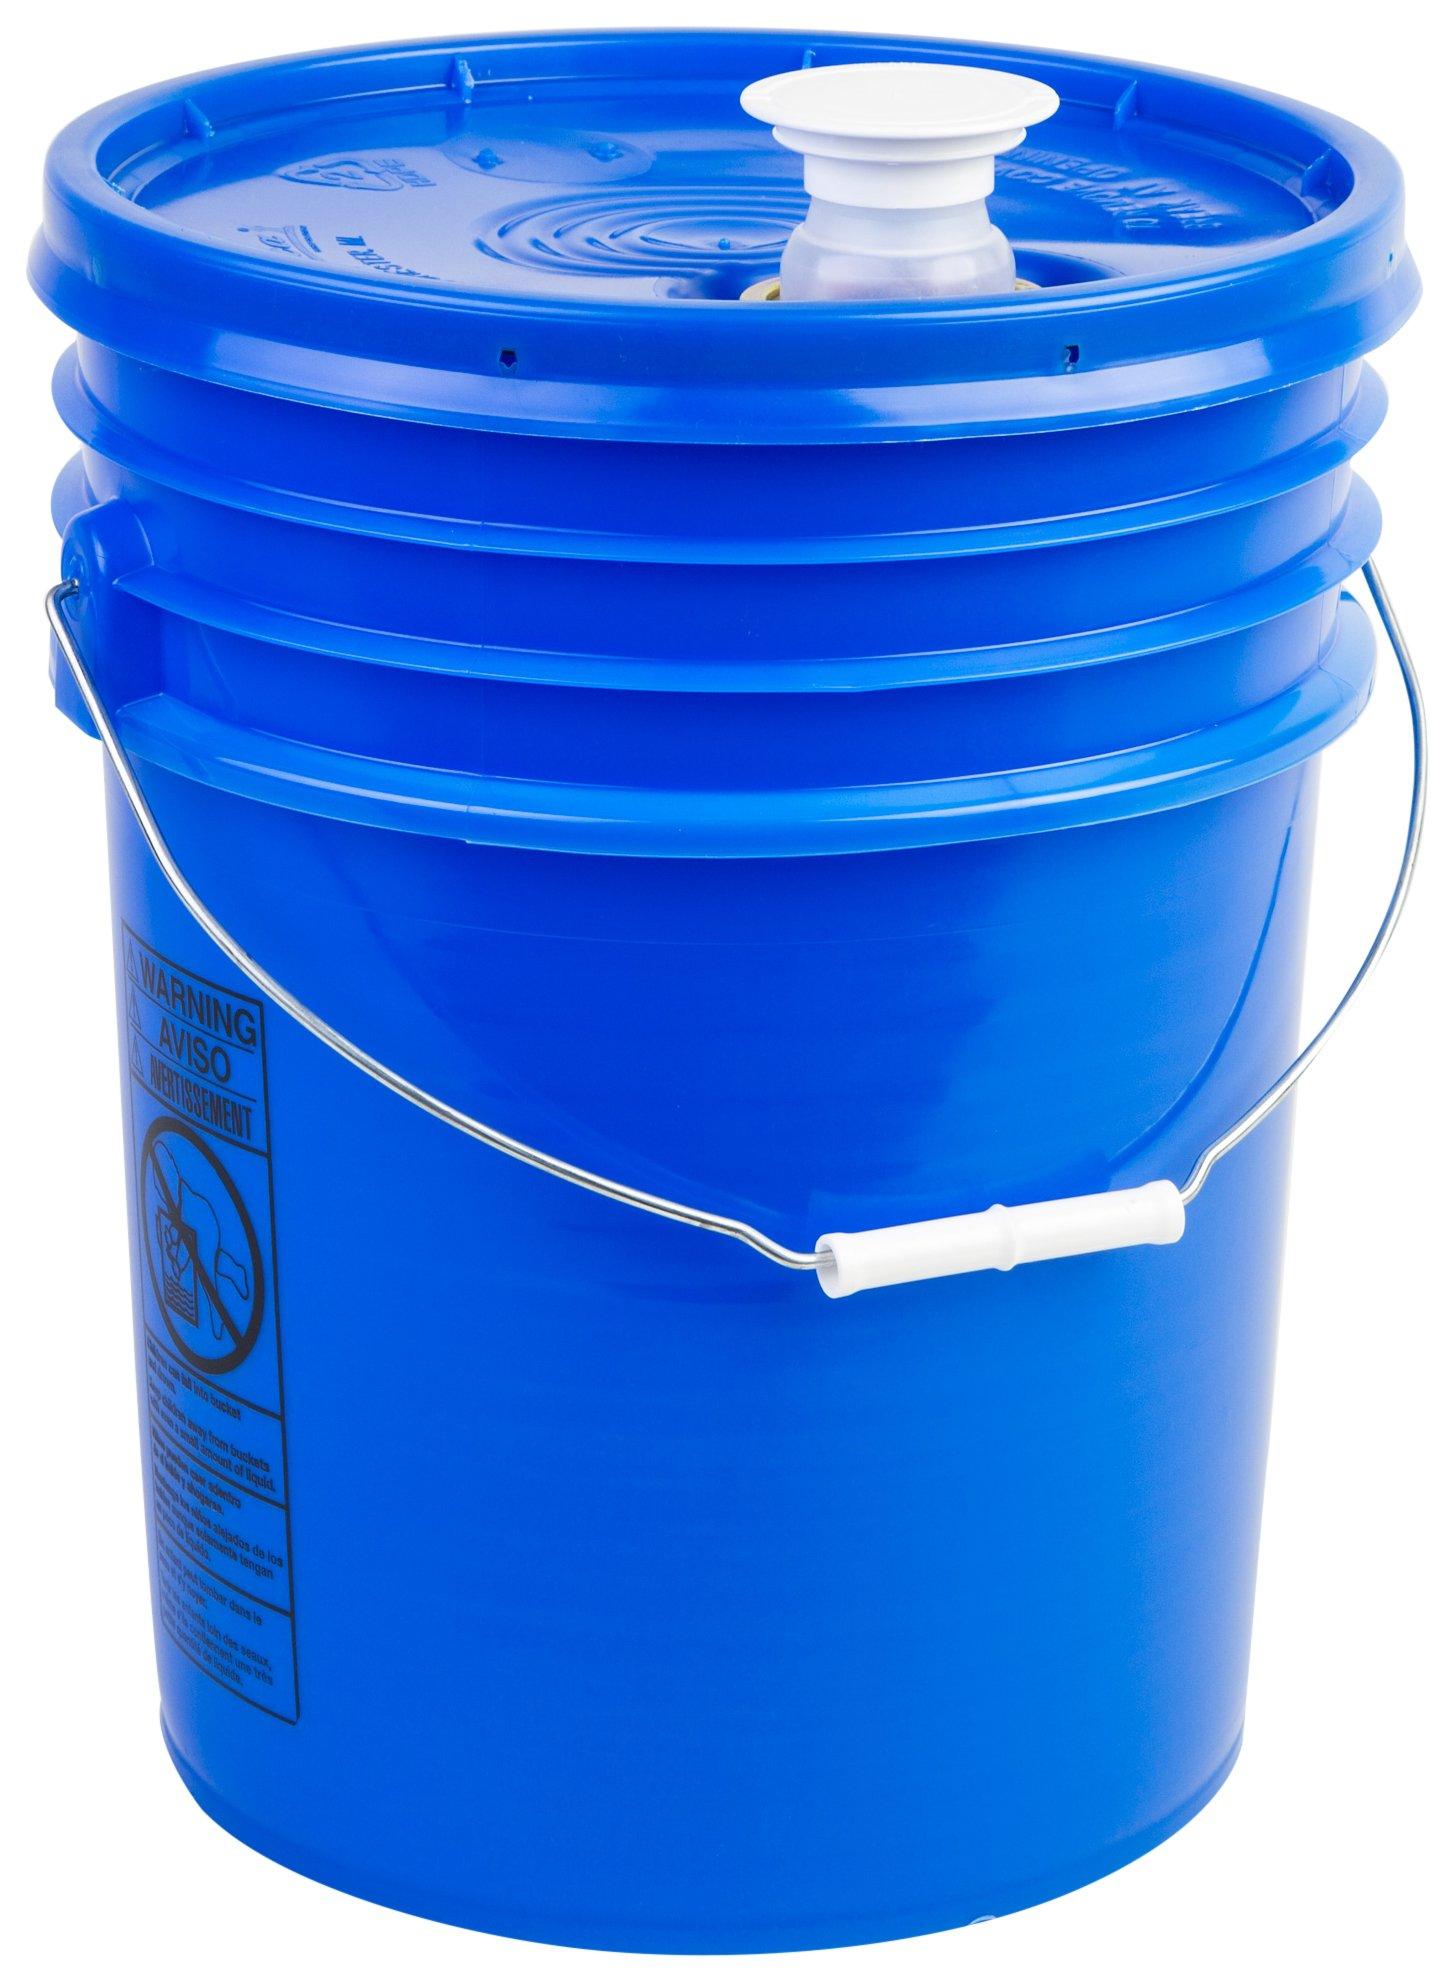 Hudson Exchange Premium 5 Gallon Bucket with Rieke Lid, HDPE, Blue, 6 Pack